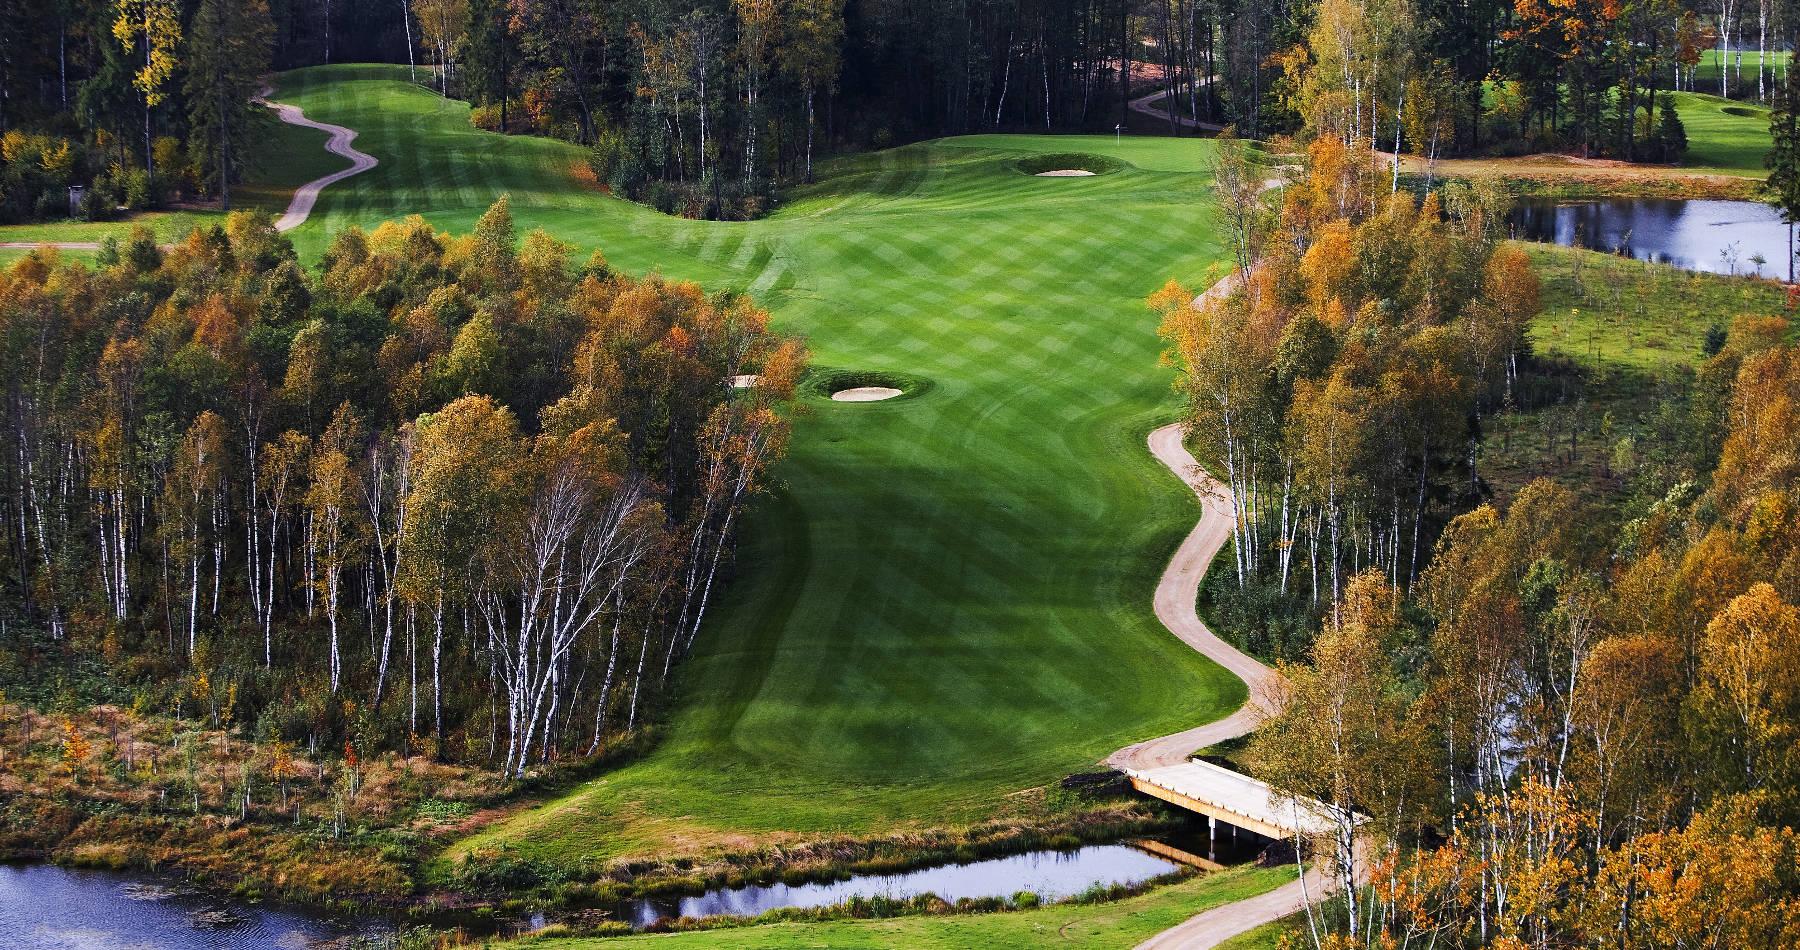 vilnius-grand-resort-samochodem-na-litwe-pole-golfowe-rzeka